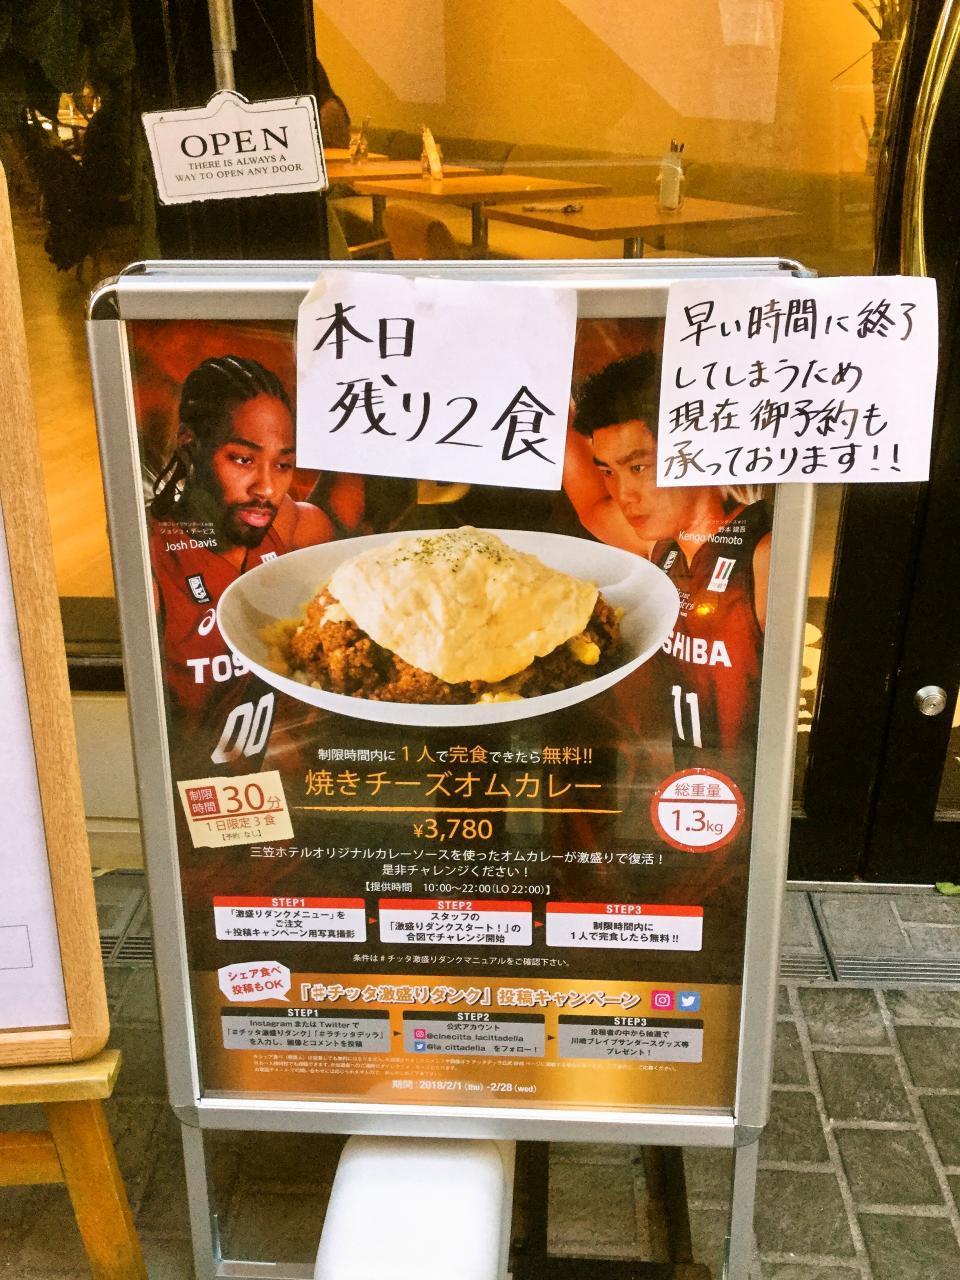 TABLE895 ラ チッタデッラ店(店舗)